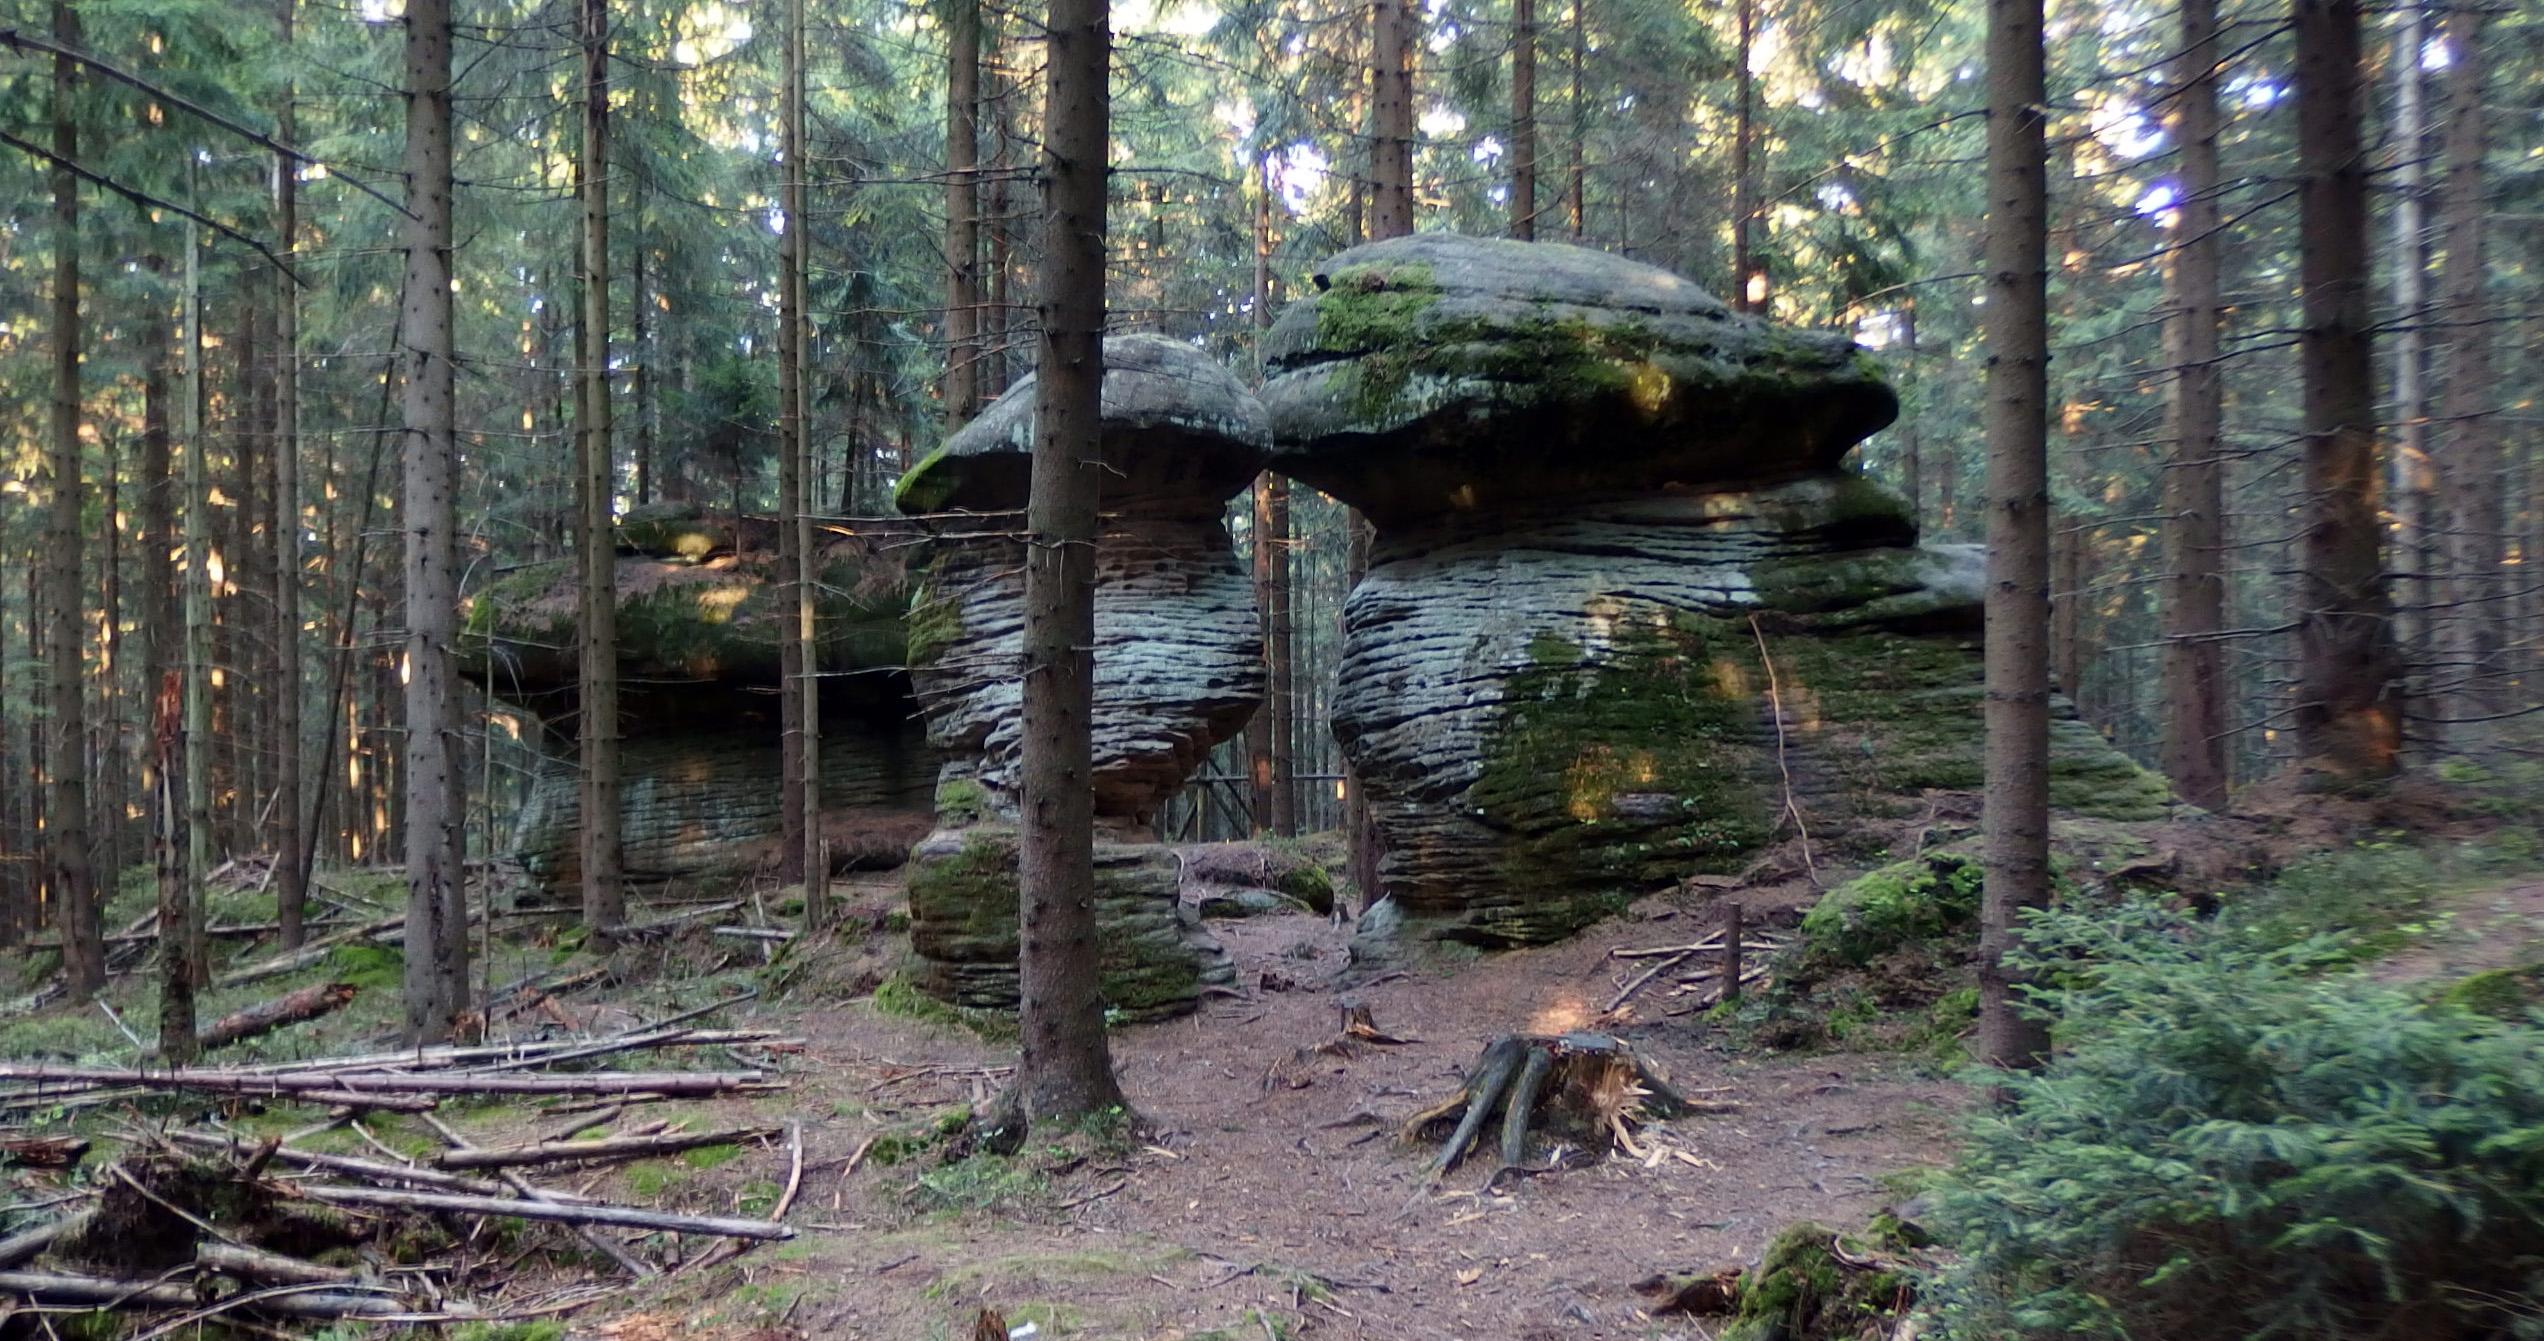 Mushroom Rocks in Stołowe Mountains National Park